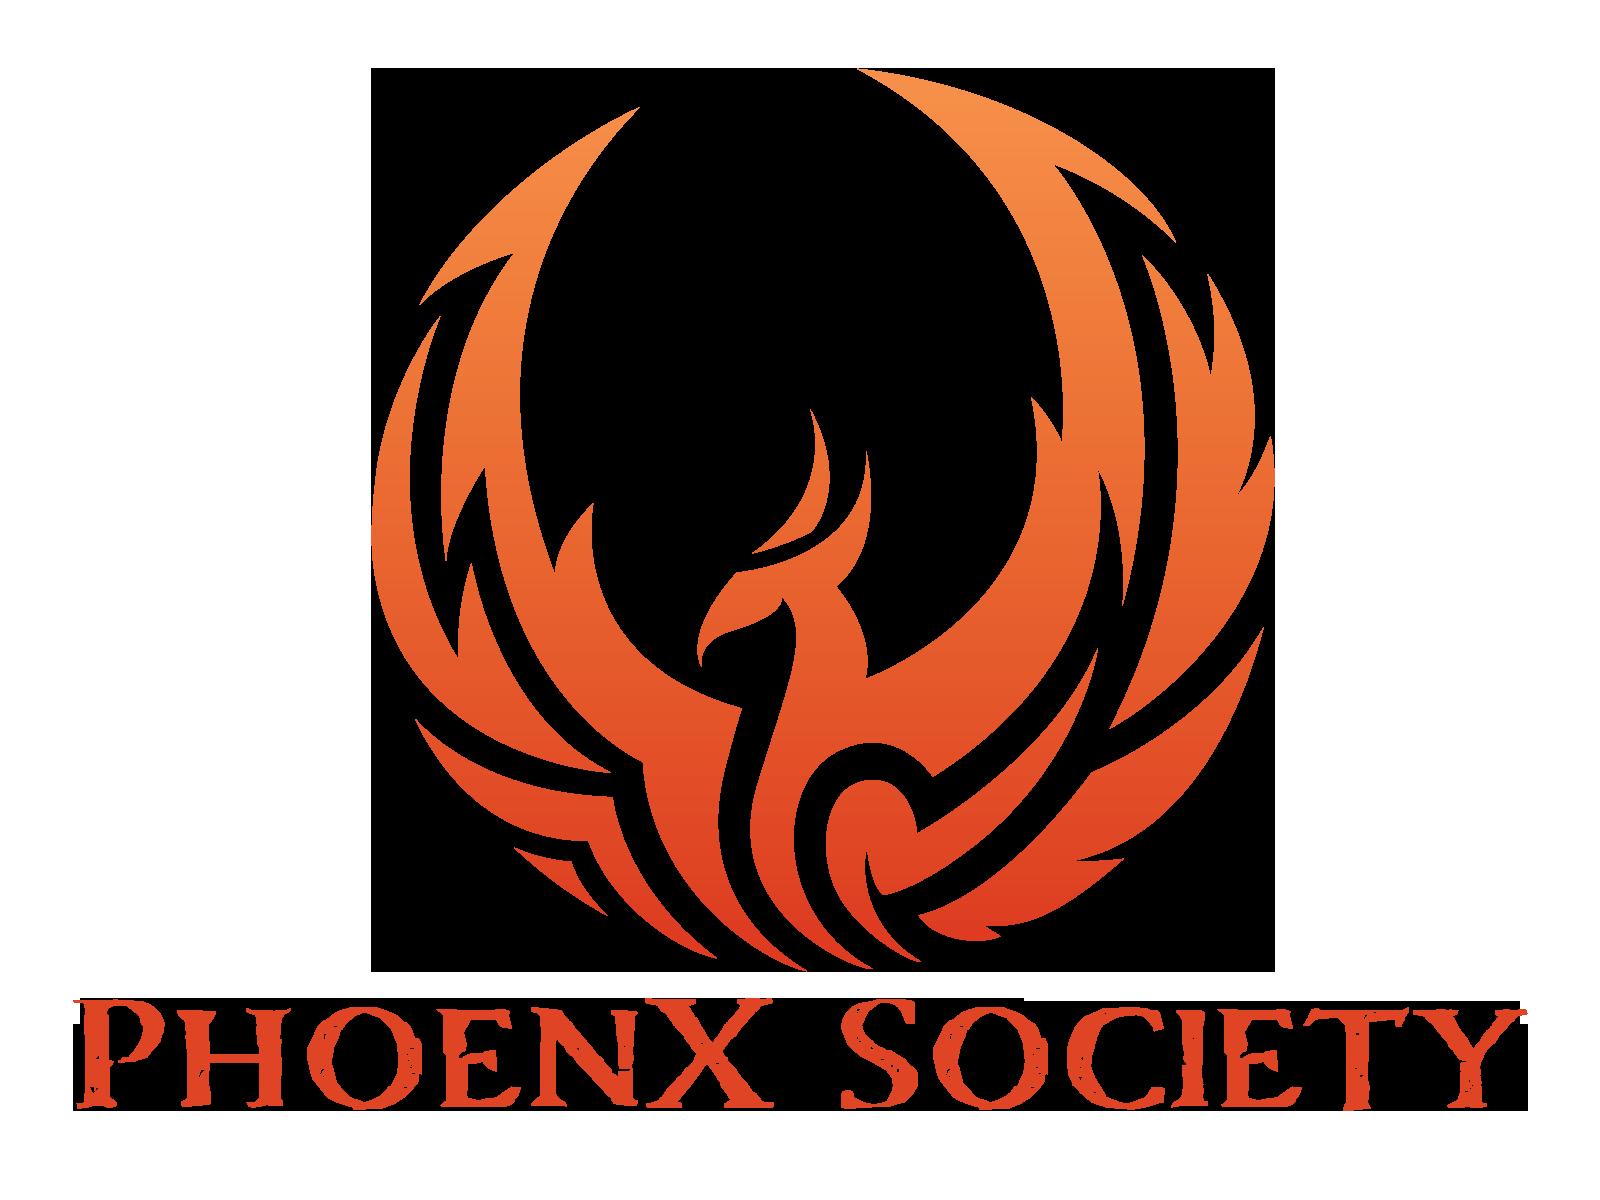 phoenx_society.png